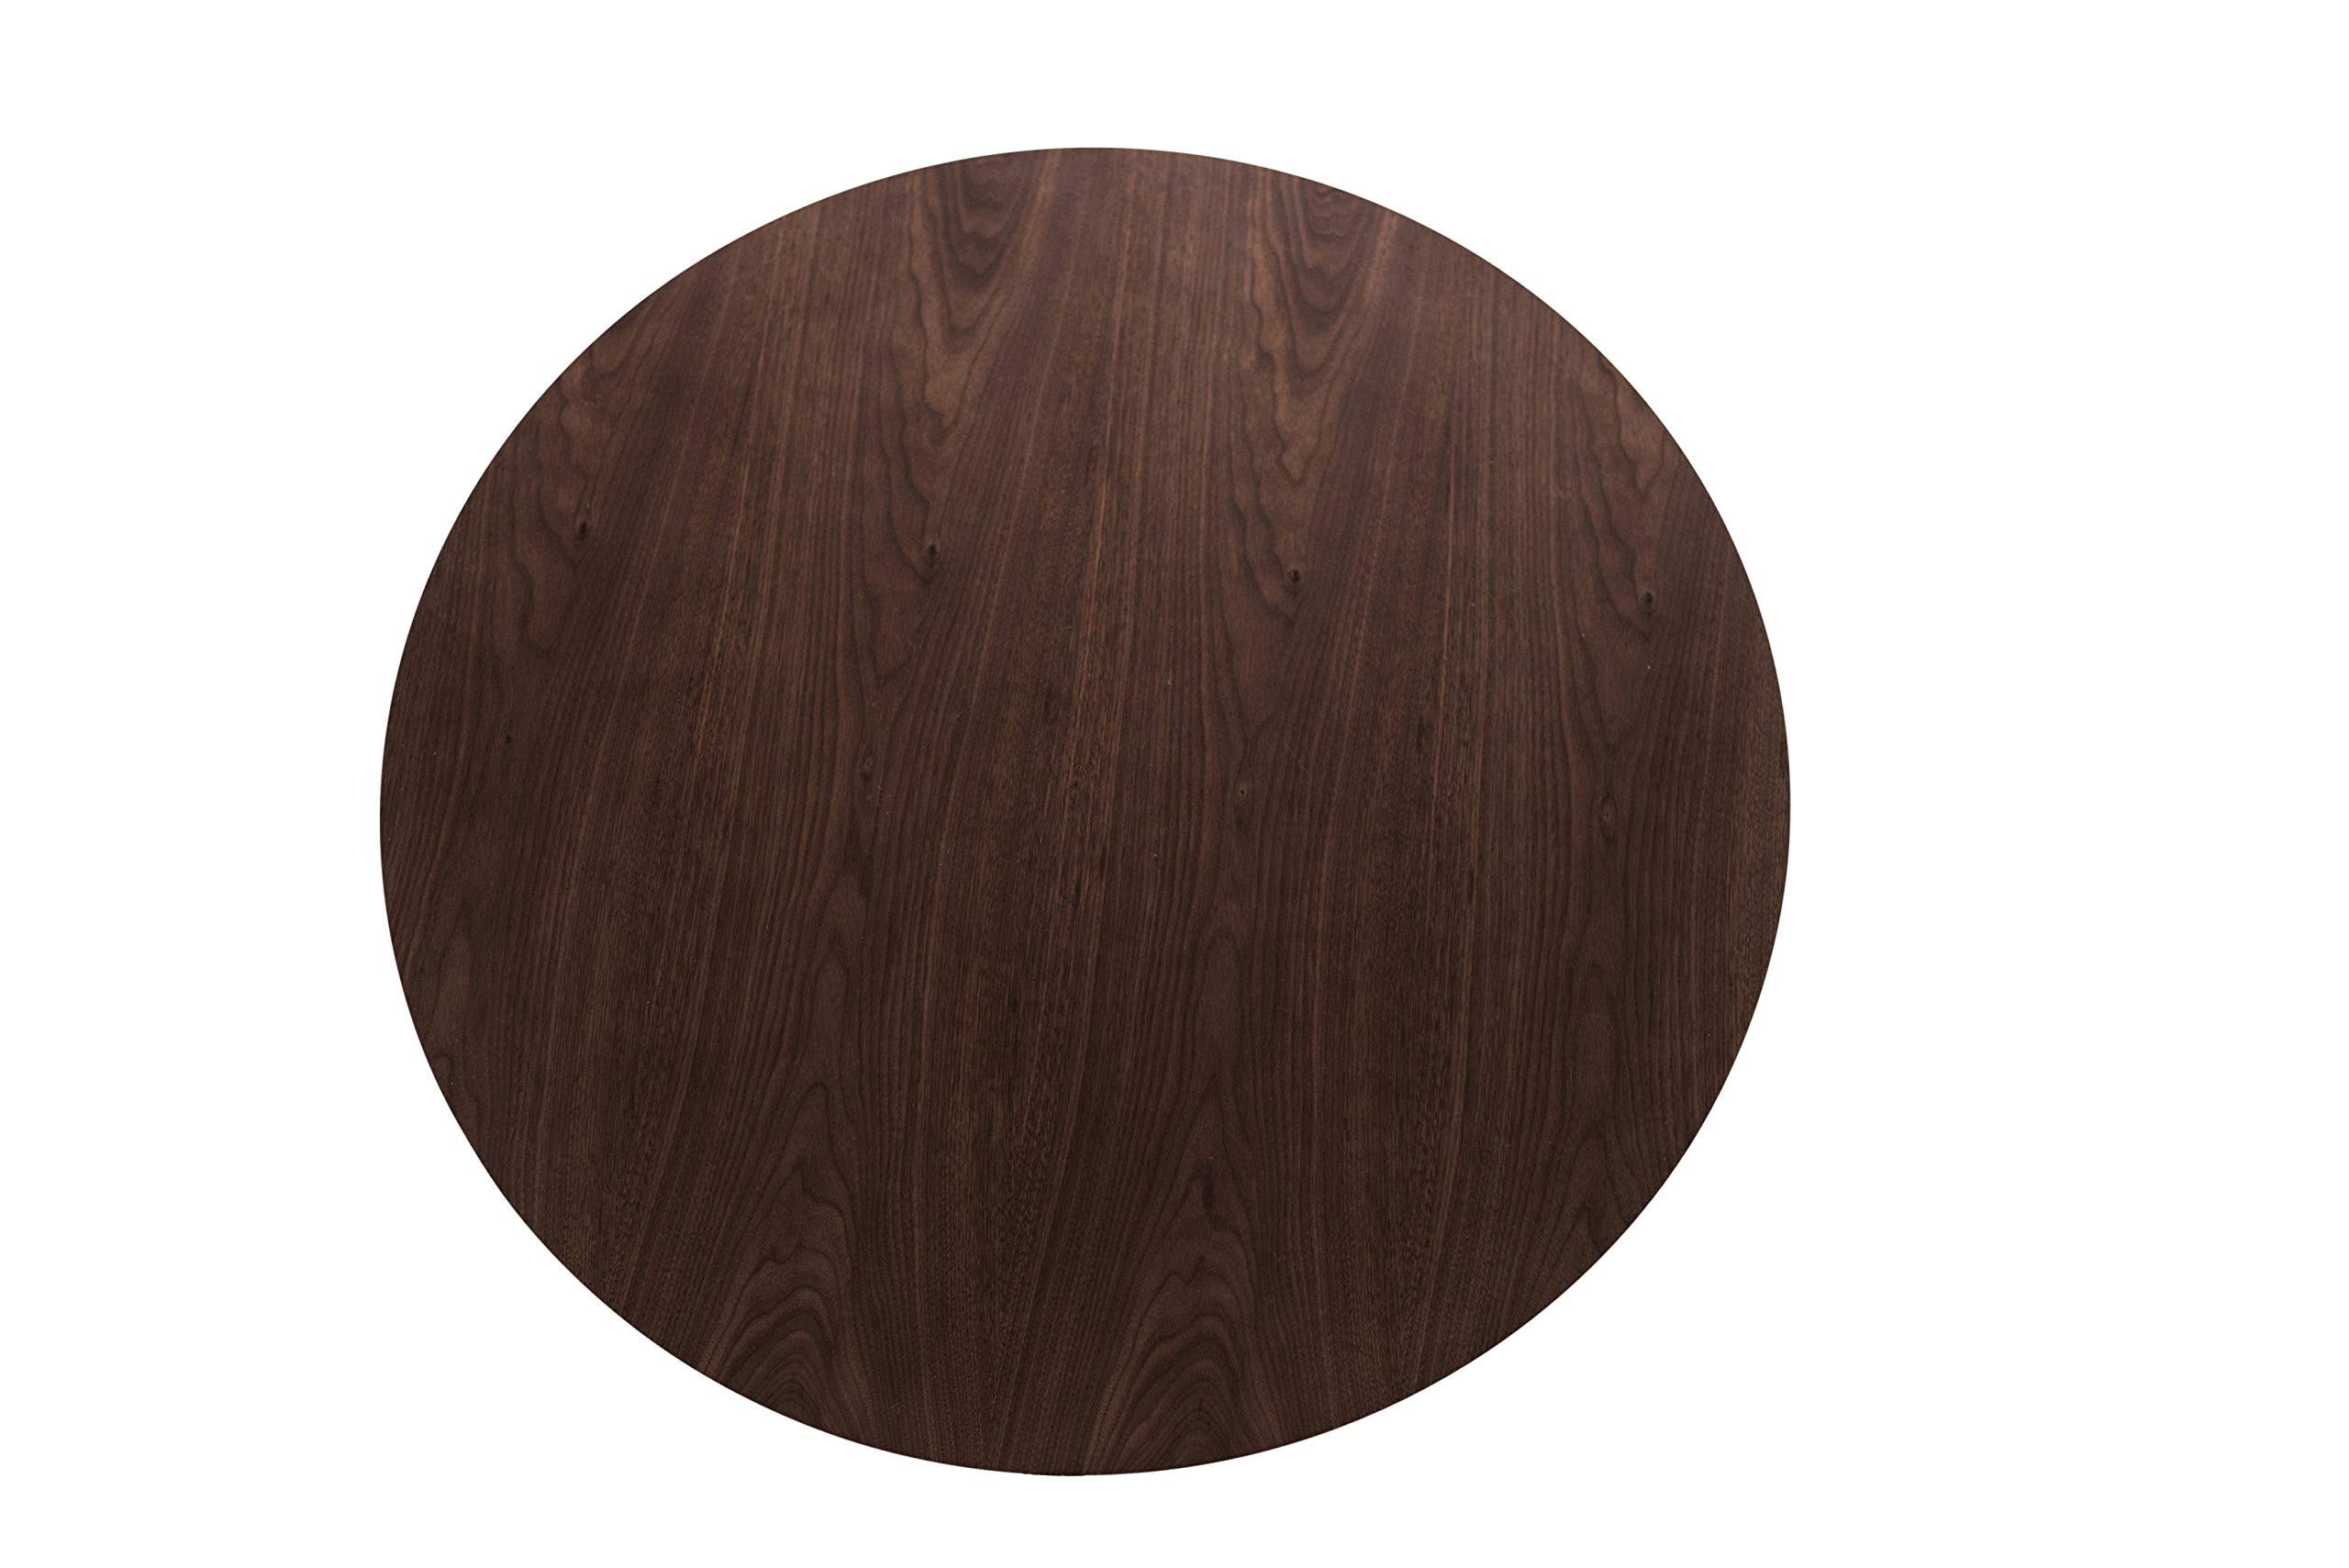 Edloe Finch YUMI Mid-Century Modern Round Dining Table Kitchen Walnut by Edloe Finch (Image #7)